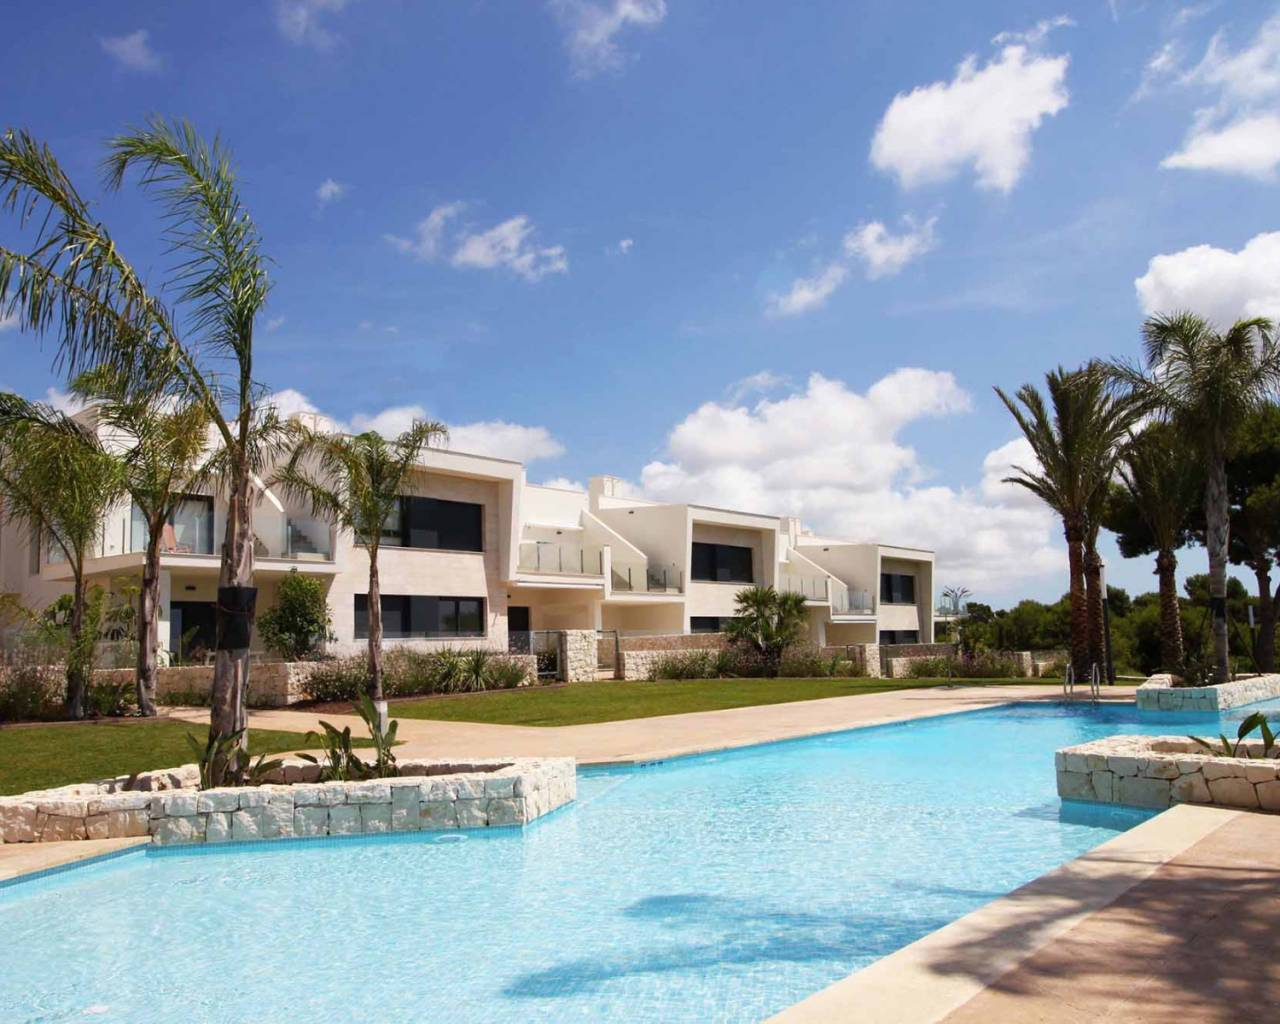 nieuwbouw-appartement-pilar-de-la-horadada_4534_xl